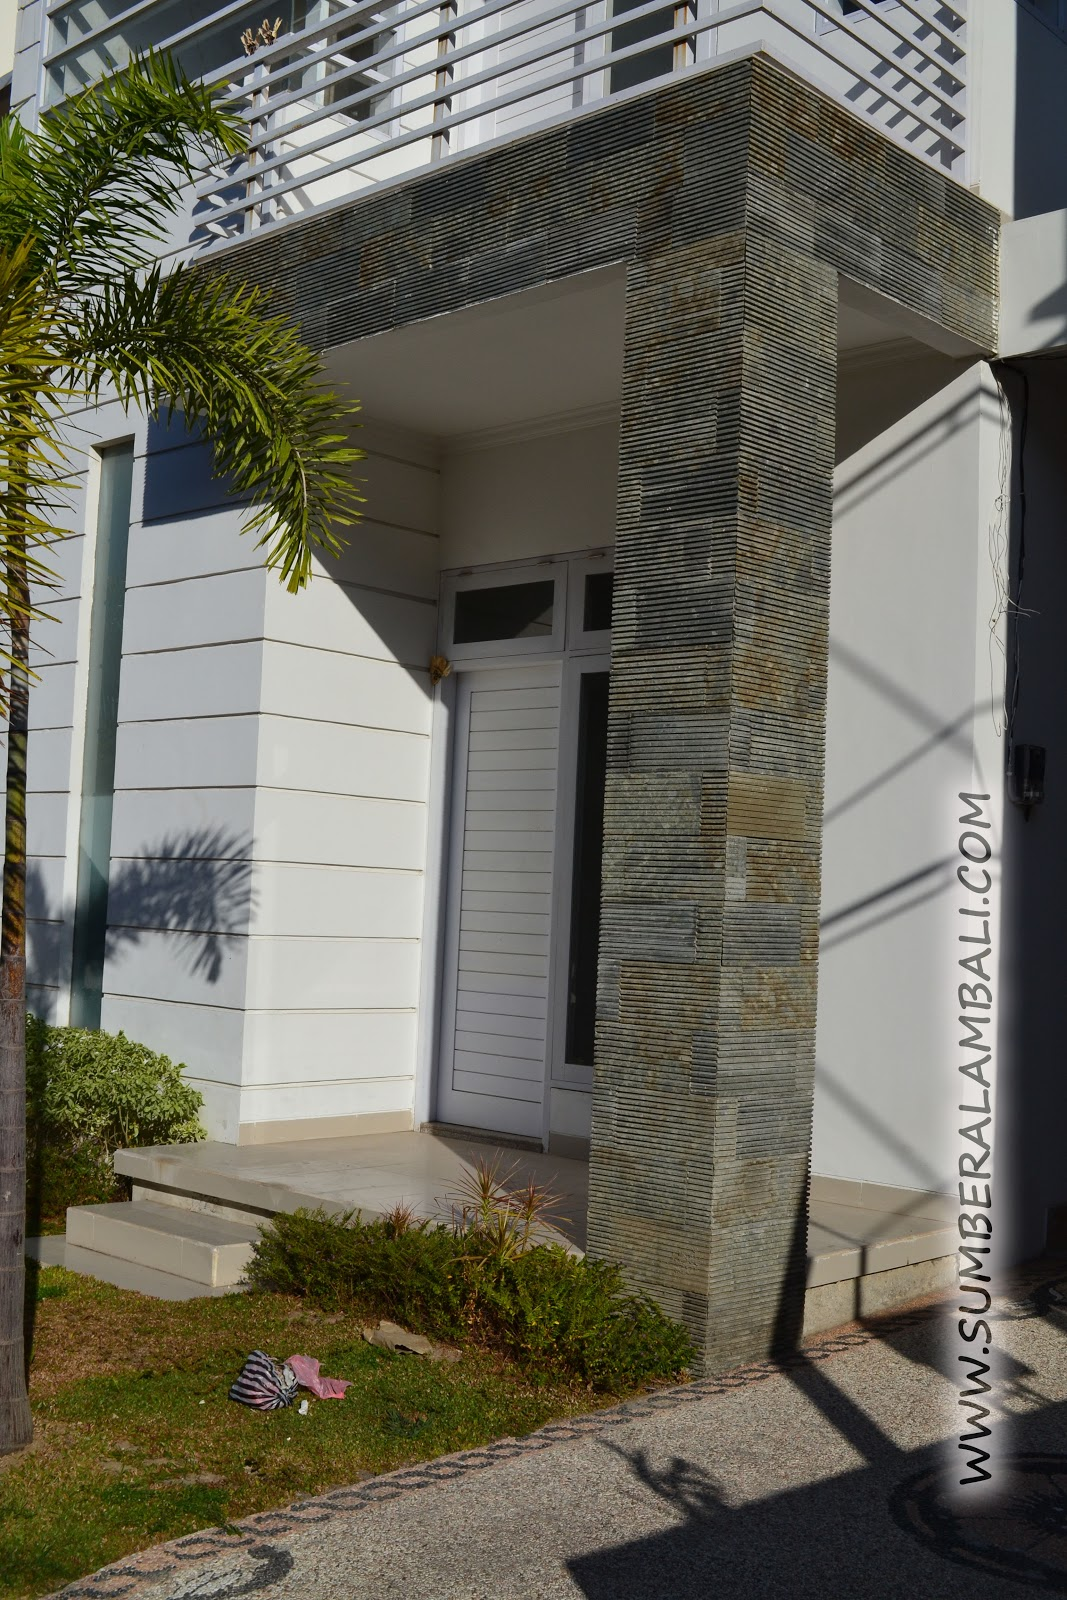 Pengetahuan: Contoh pemasangan batu alam pada dinding rumah Batu Alam